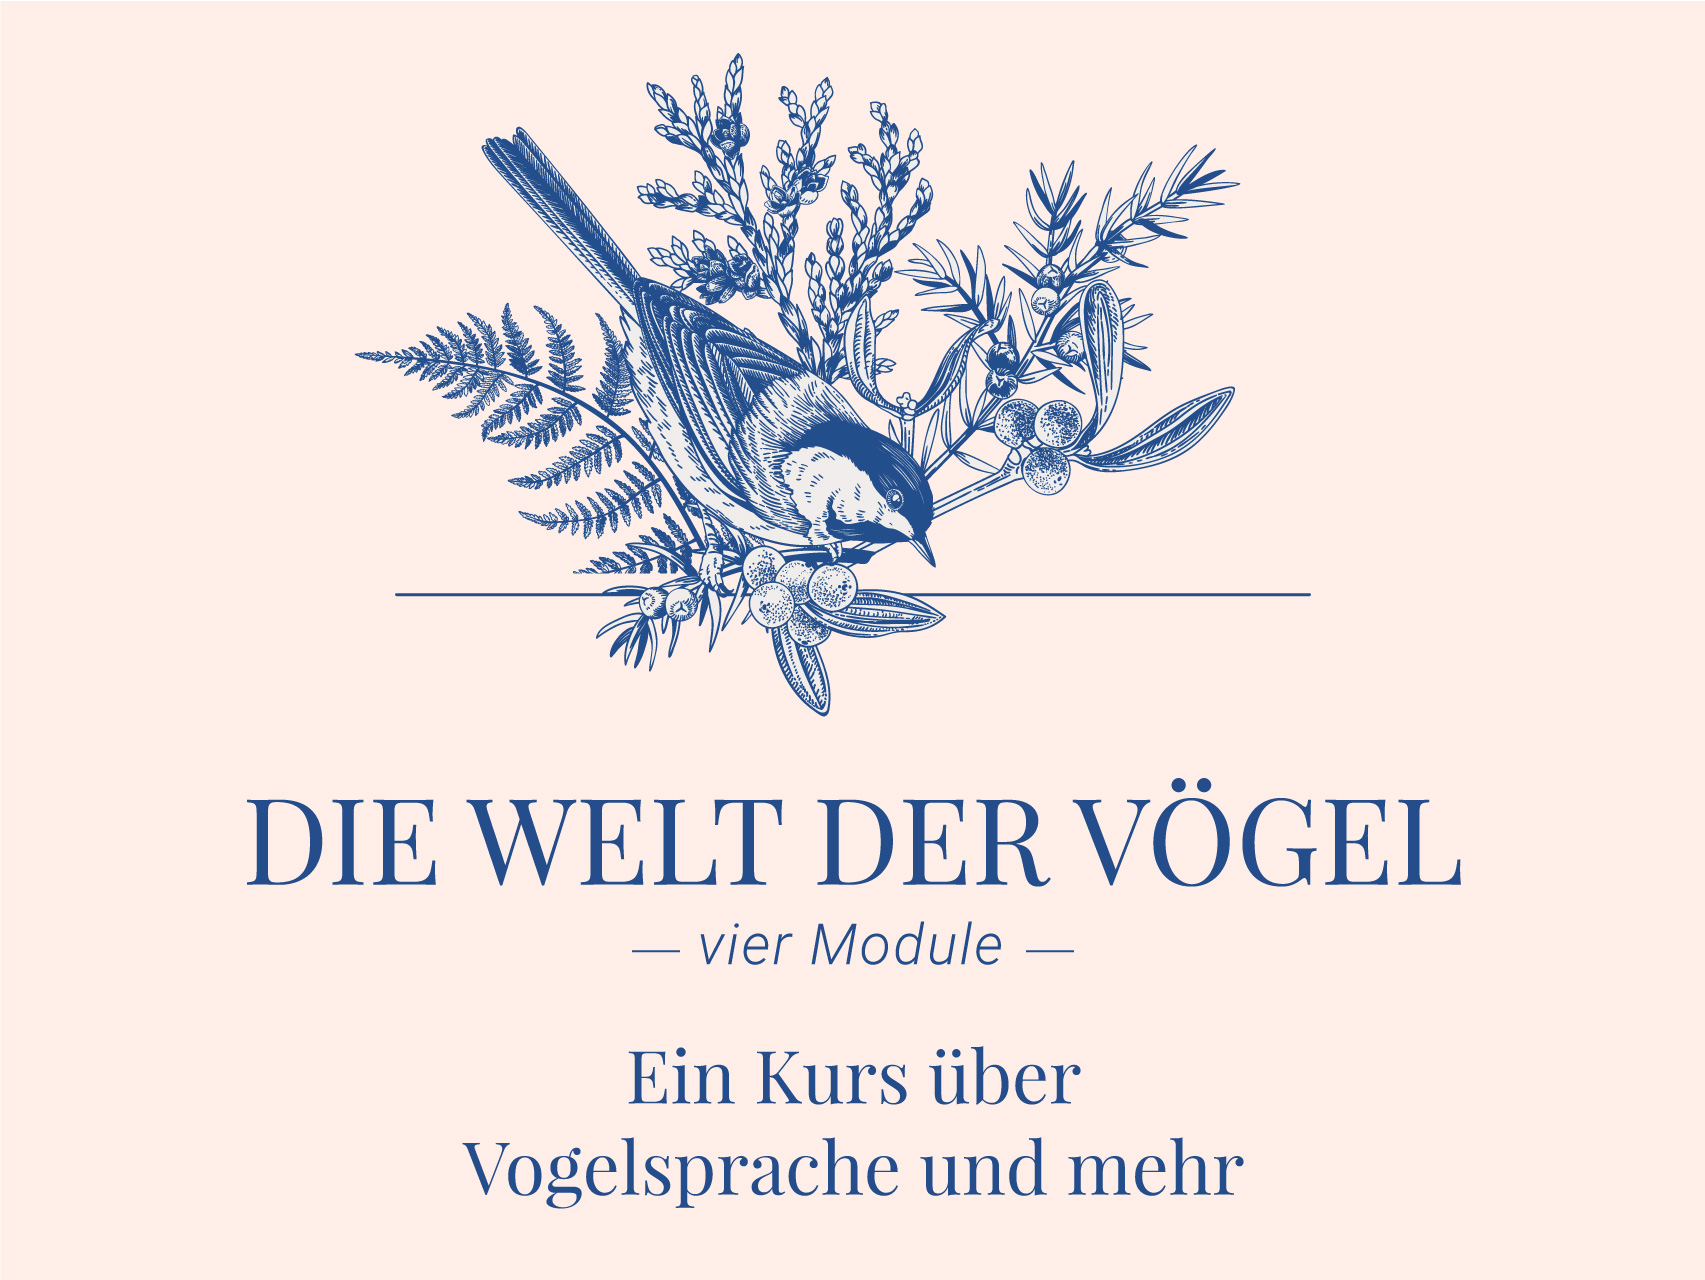 Naturverbindung Berlin Vogelkunde Vogelsprache Wildnispädagokgik